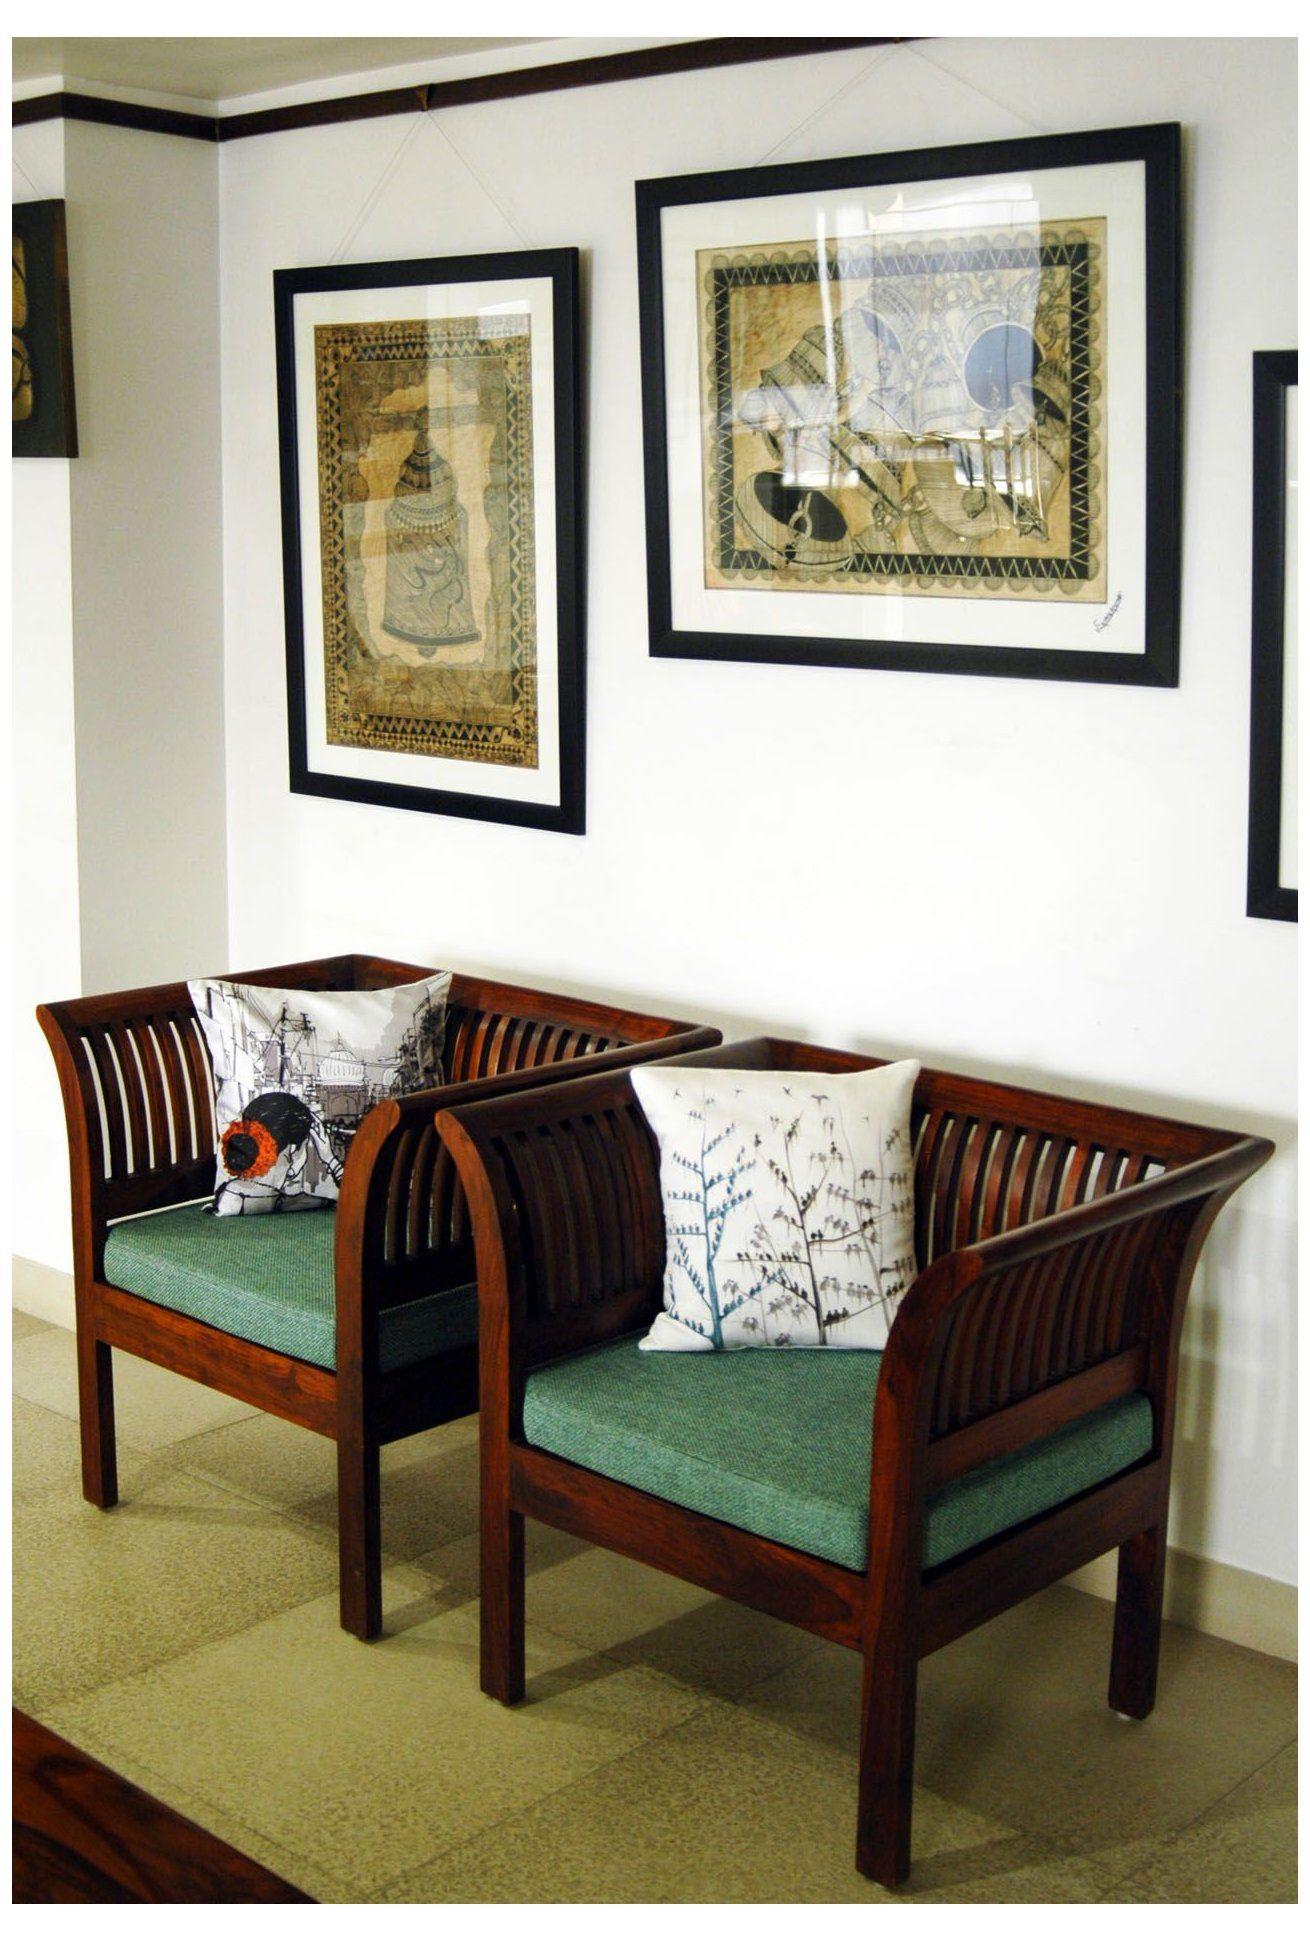 Drawing Room Sofa Designs India: #sofa #set #designs #indian Rose Wood Sofa Chair Set In